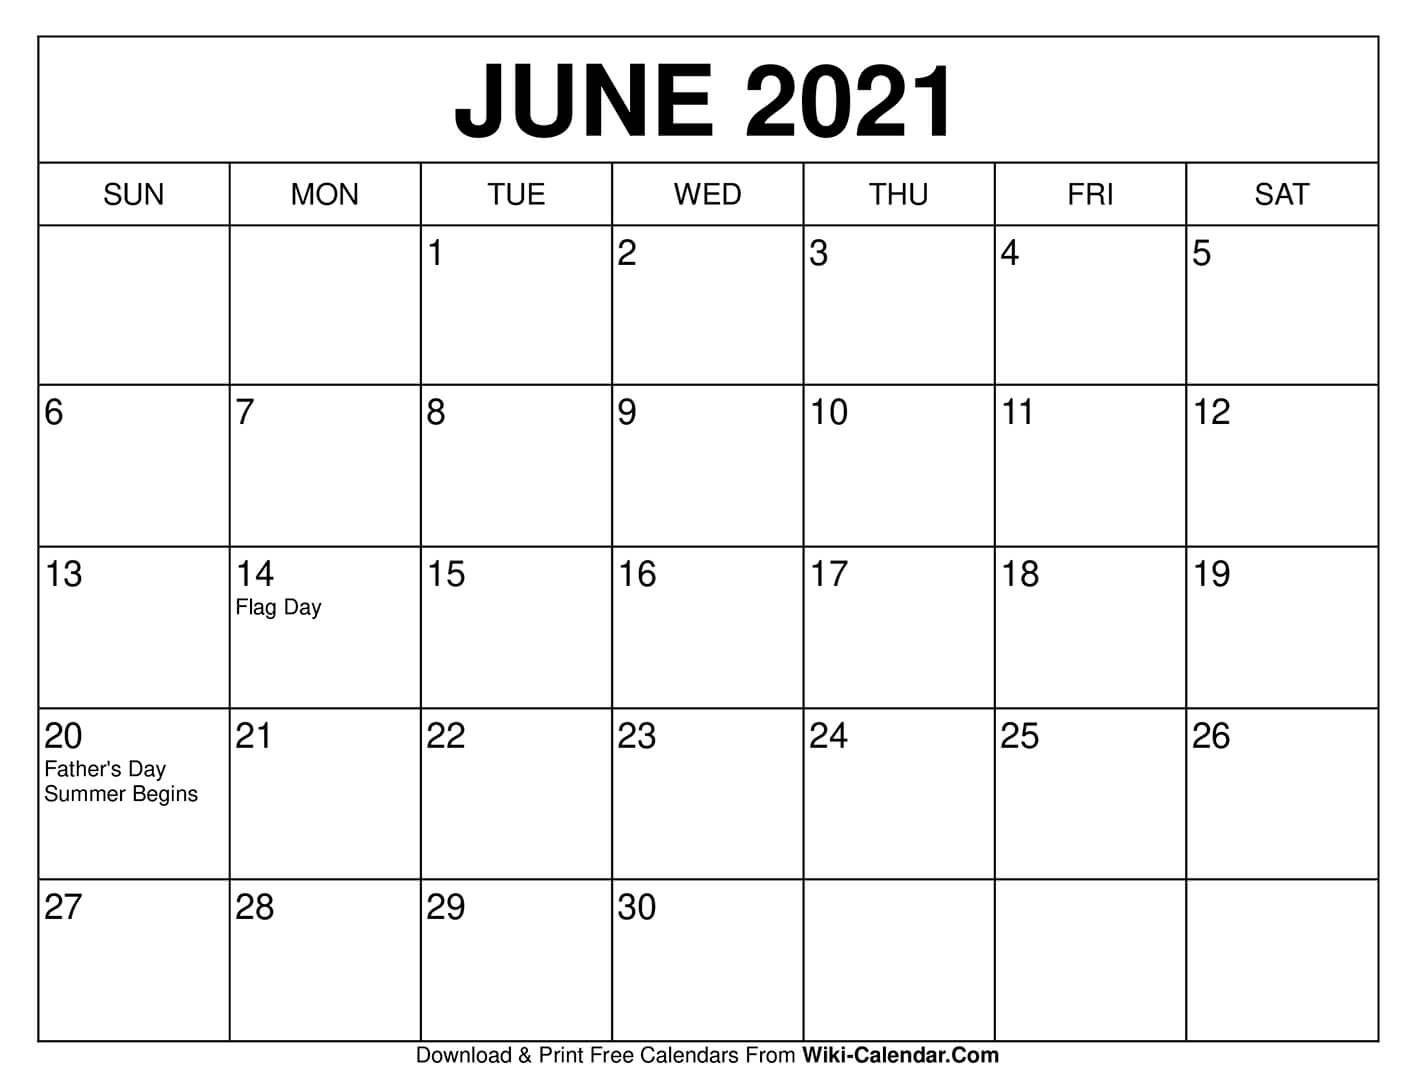 June 2021 Calendar In 2020 | Calendar Printables, Calendar